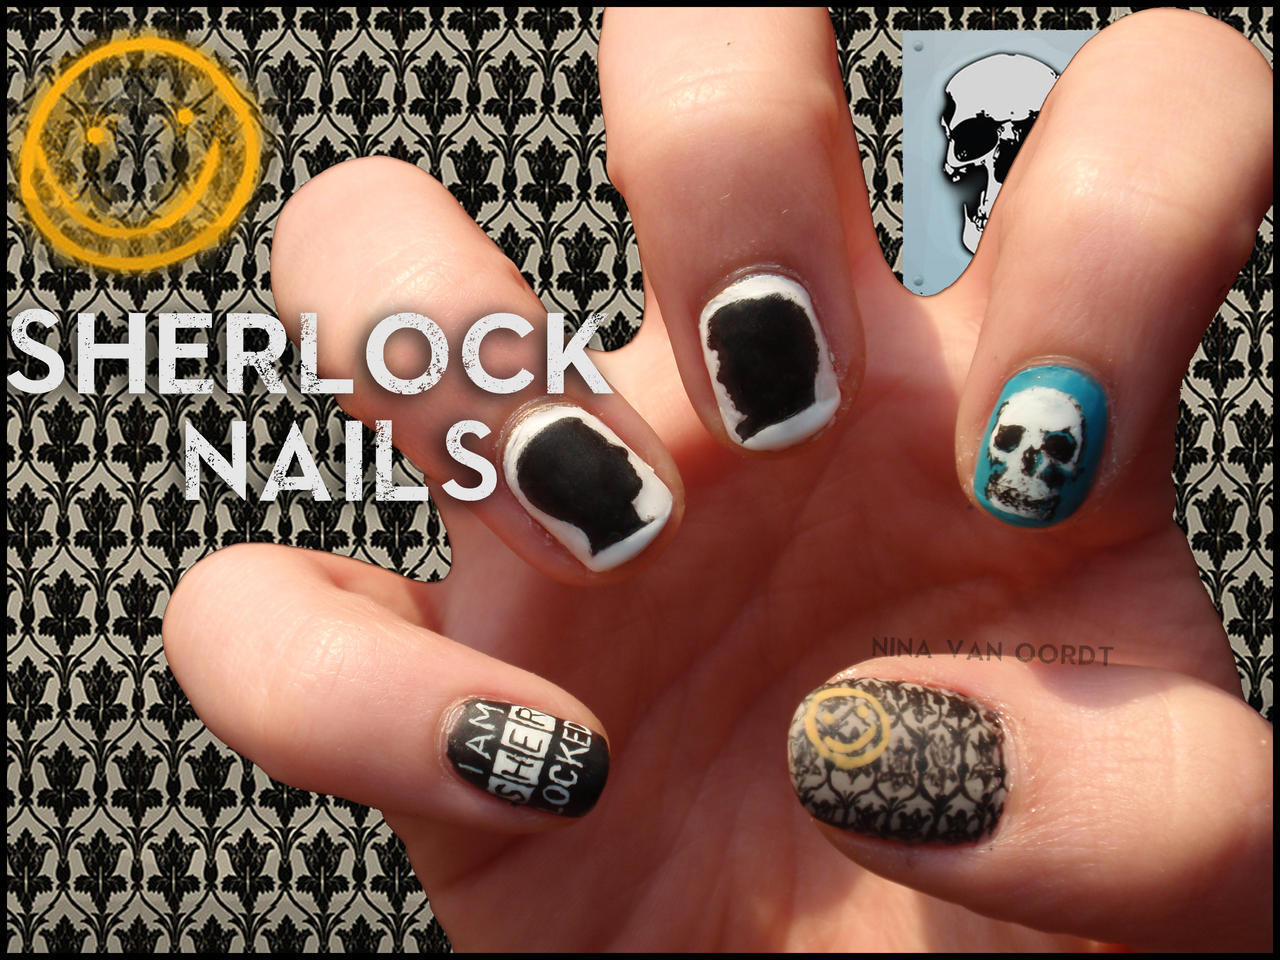 Death note nail art. by smamz on DeviantArt